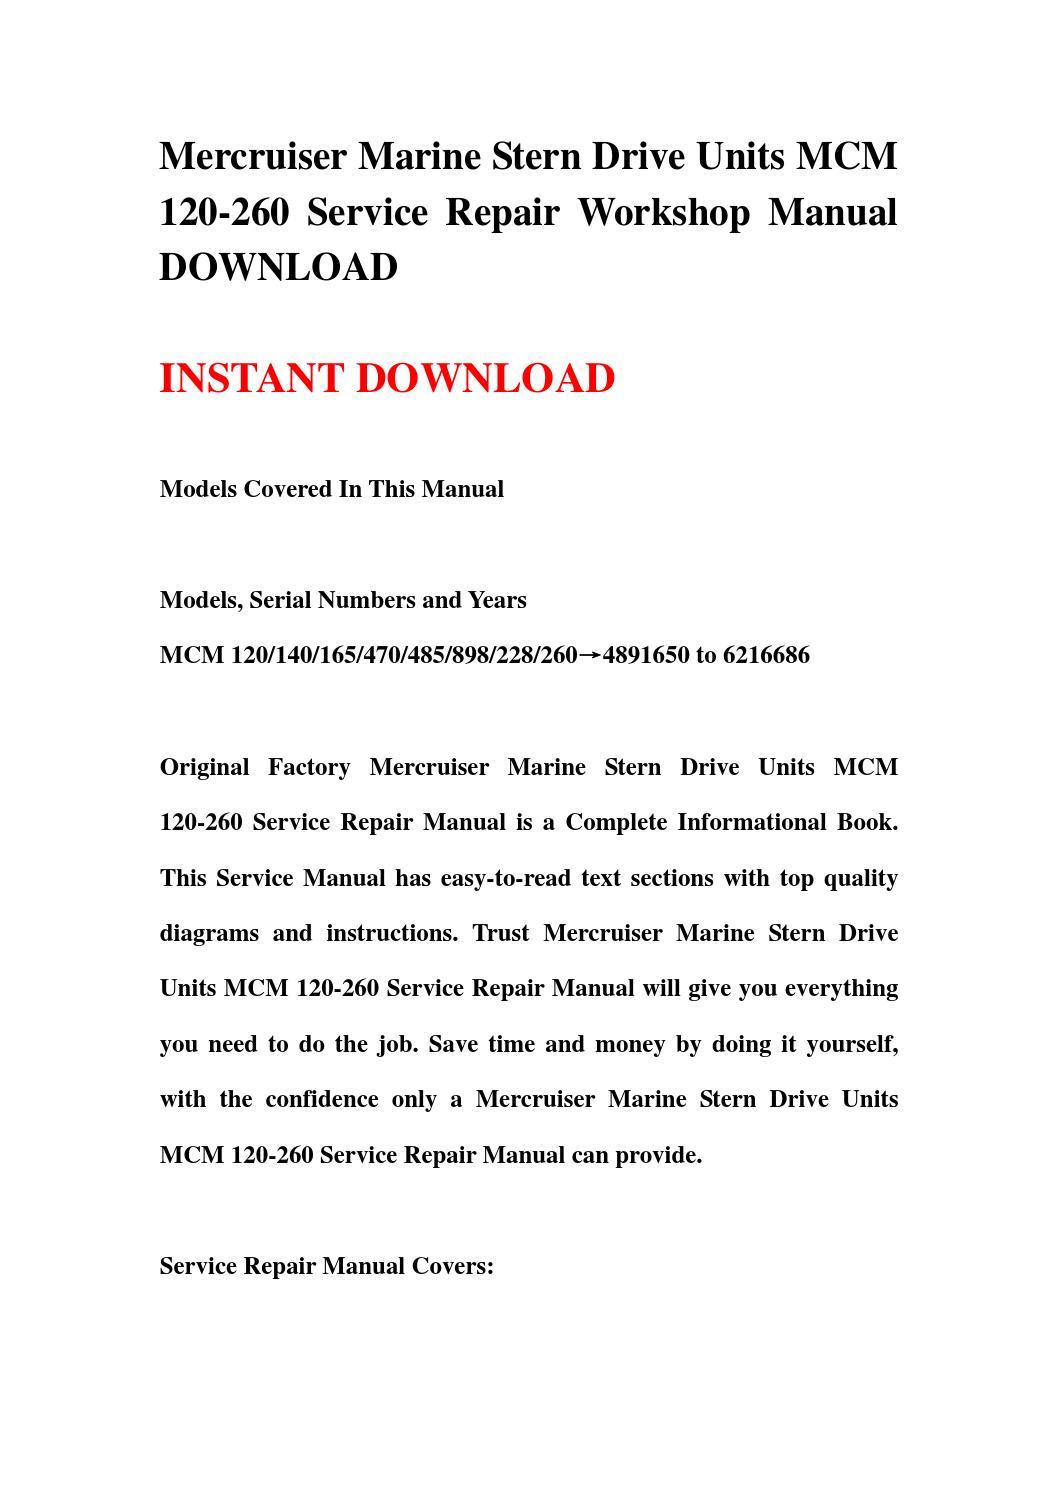 mercruiser marine stern drive units mcm 120 260 service repair rh issuu com 12H802 Manual Downloadable Online Chevrolet Repair Manuals